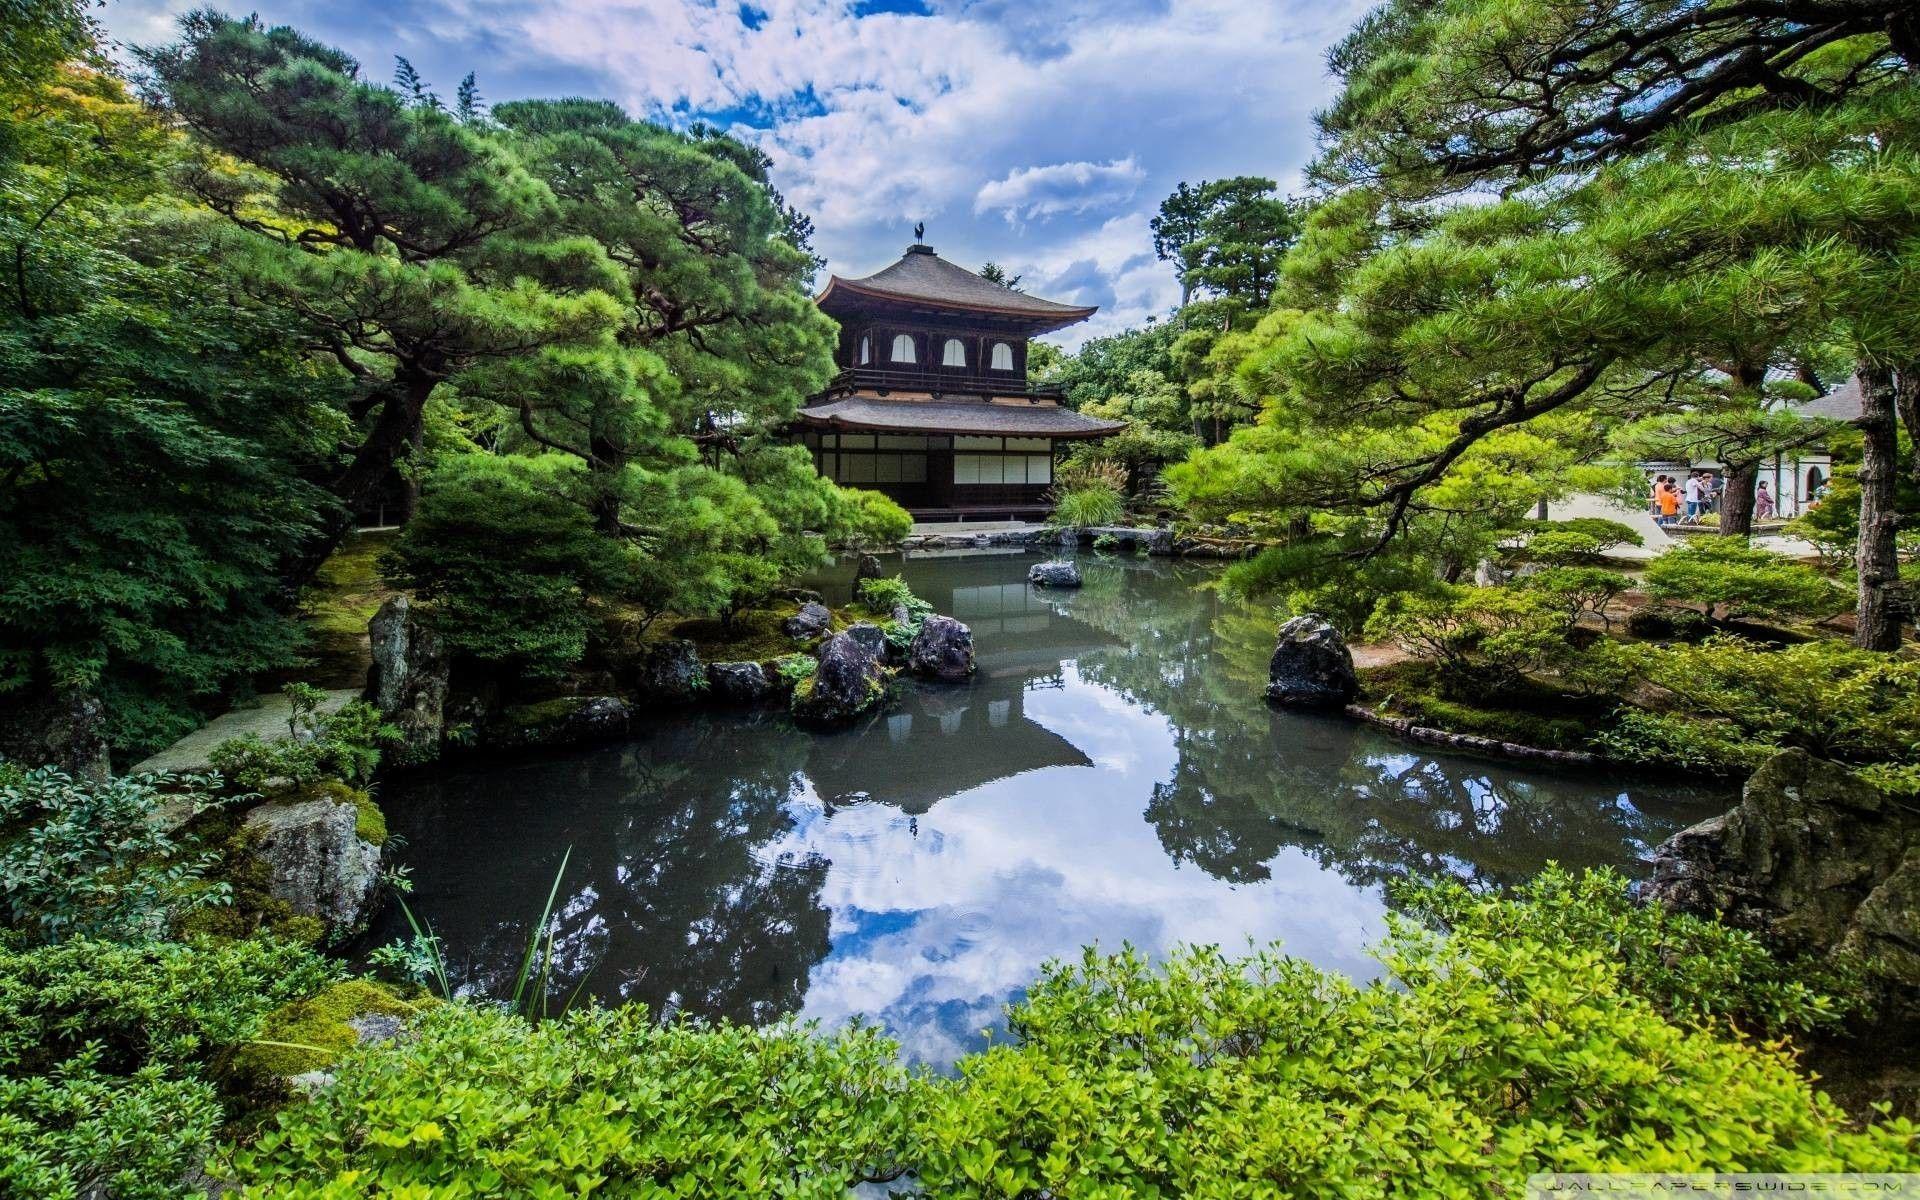 10 Best Zen Garden Wallpaper Hd Full Hd 1080p For Pc Background